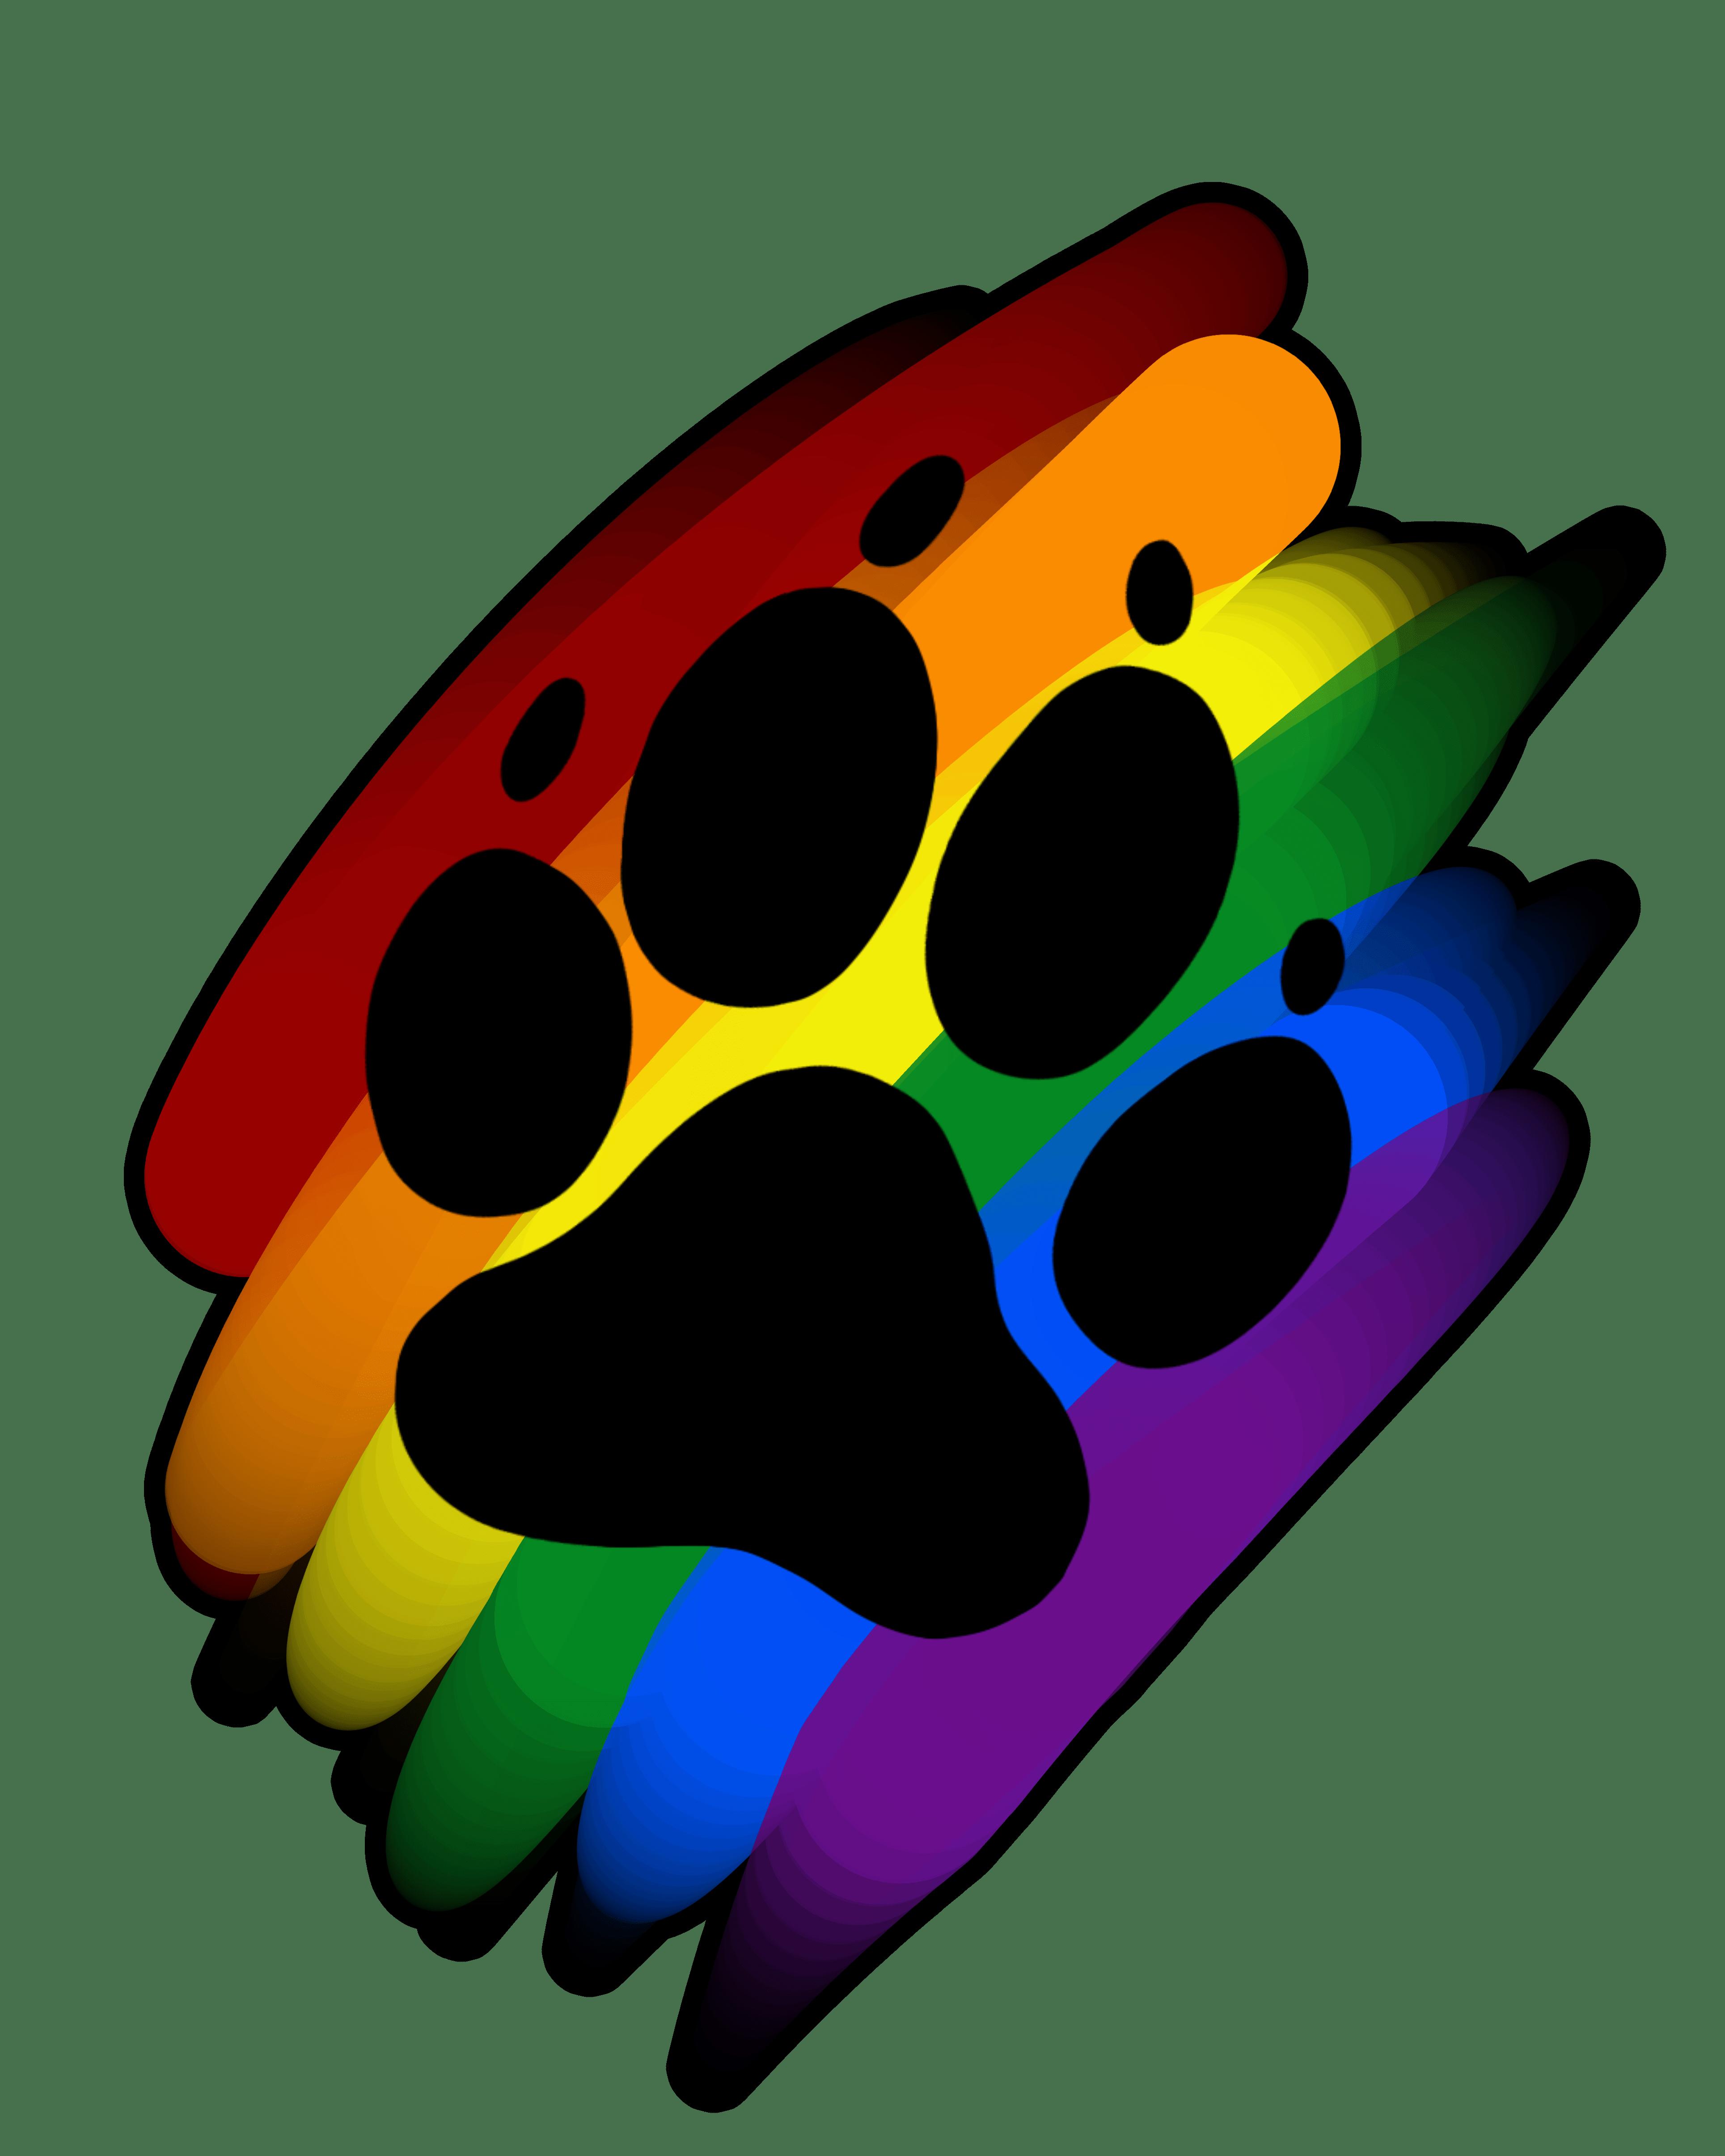 Rainbow pumpkin clipart image free stock Rainbow paw print marker | Artworktee image free stock